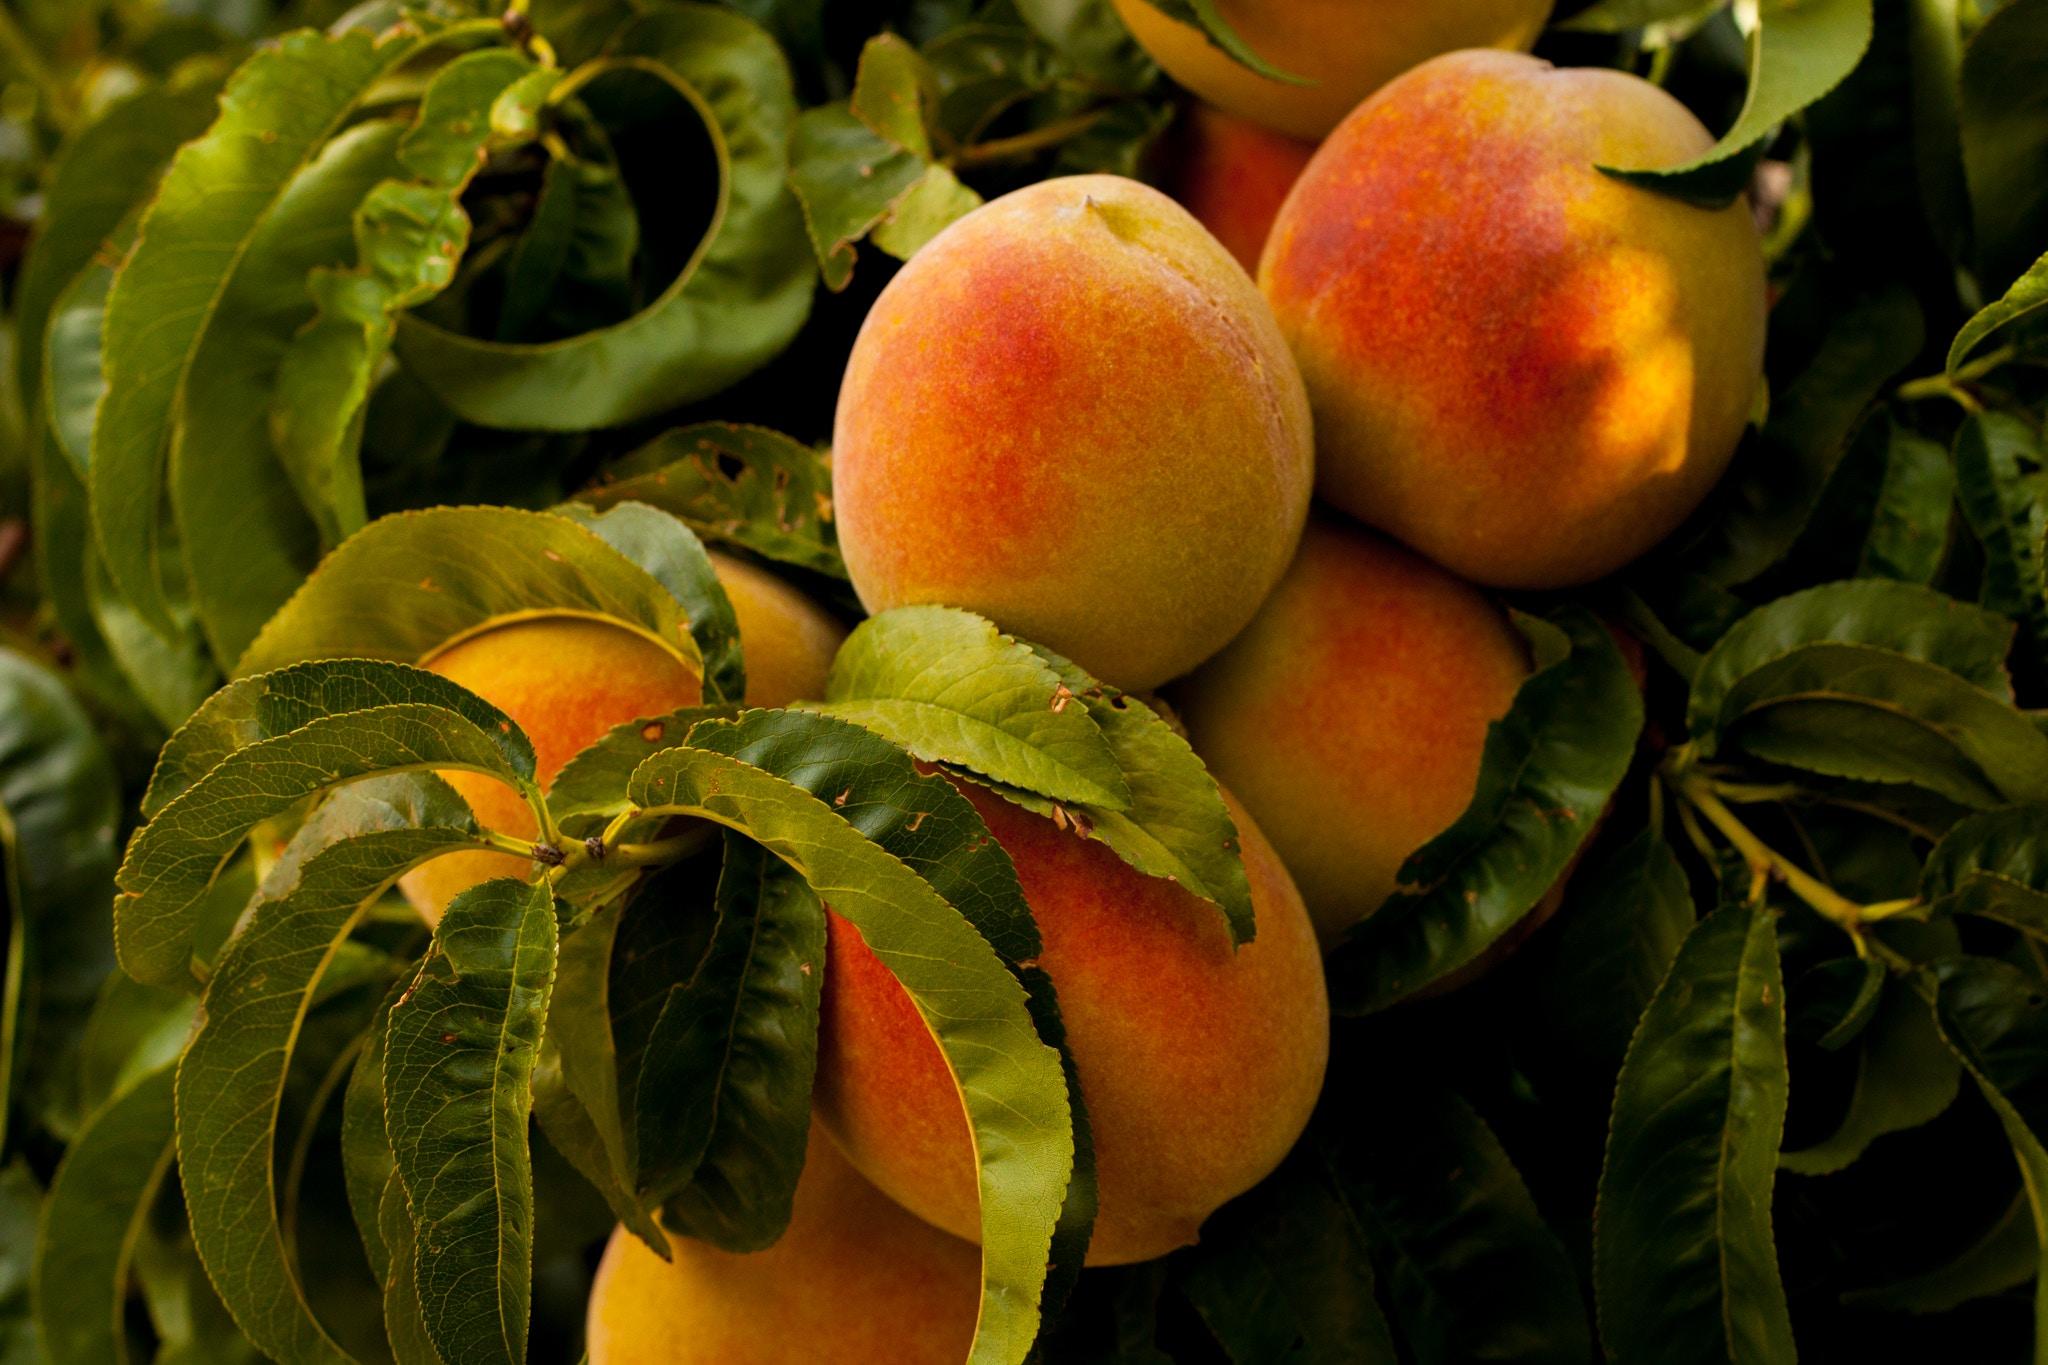 Ripe peaches on tree